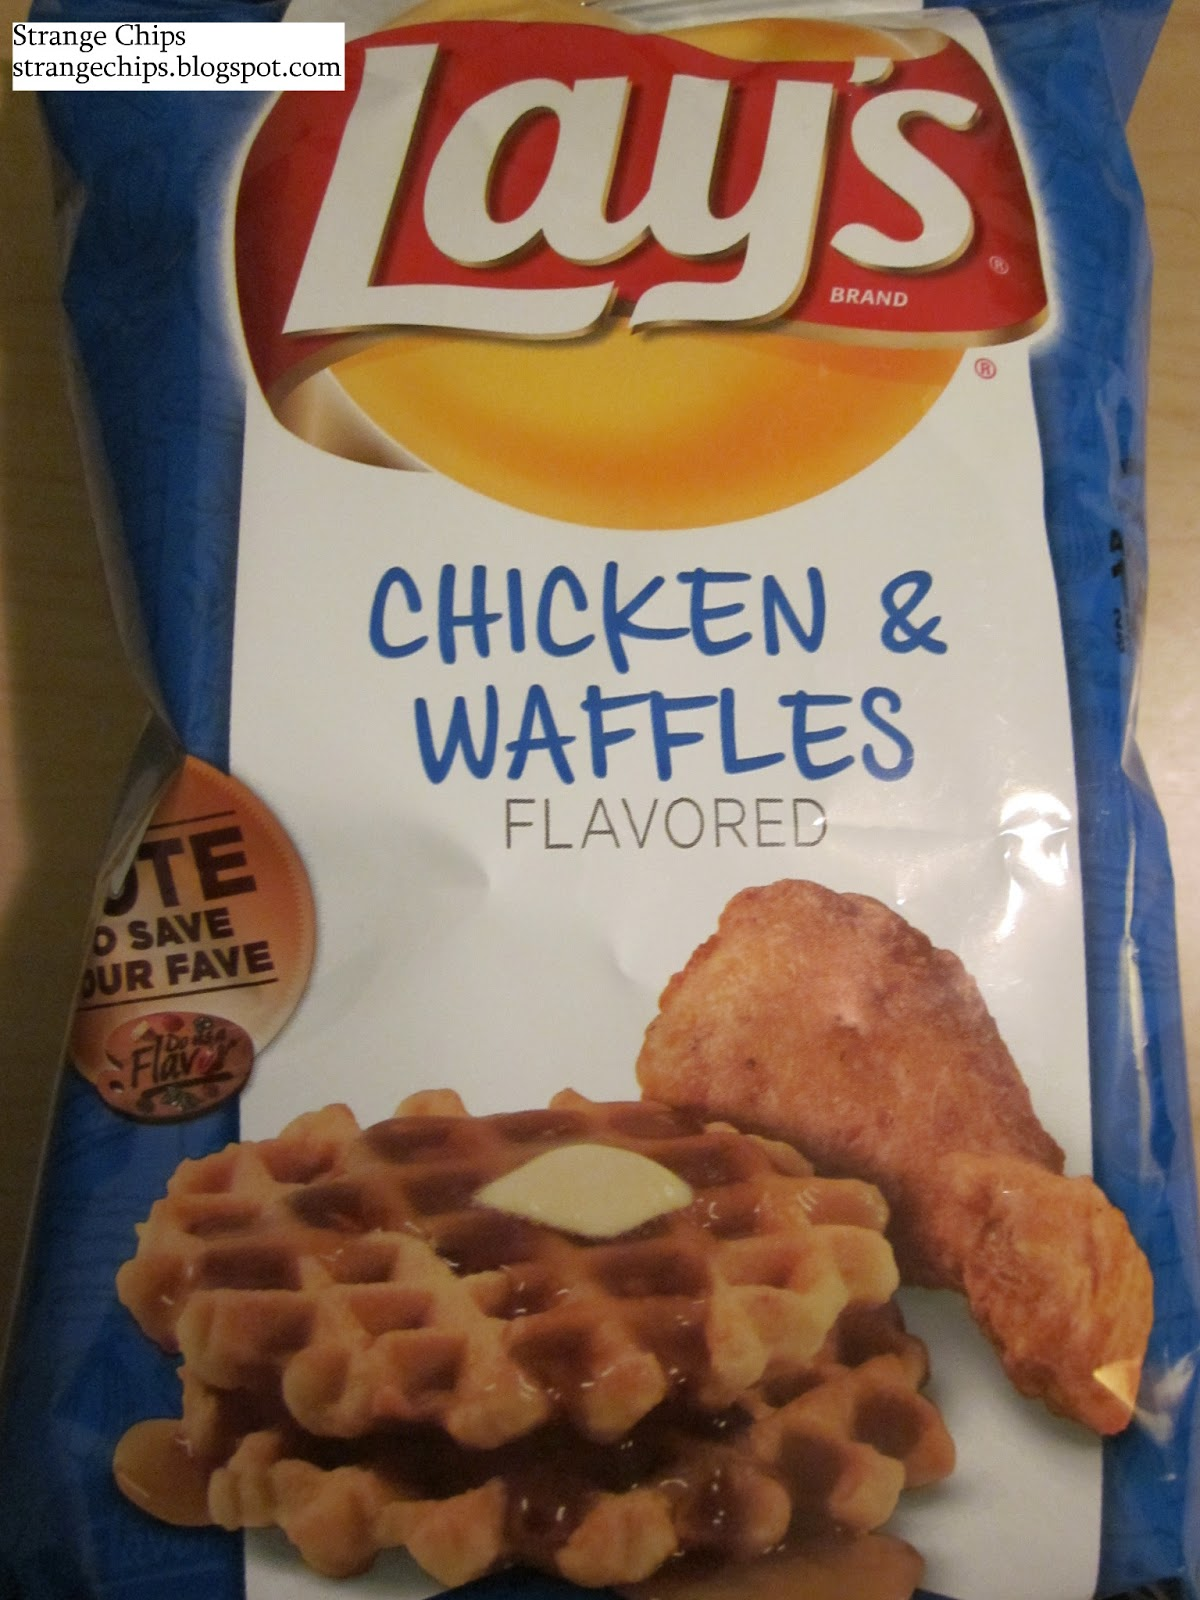 Strange Chips: Lay's Chicken & Waffles